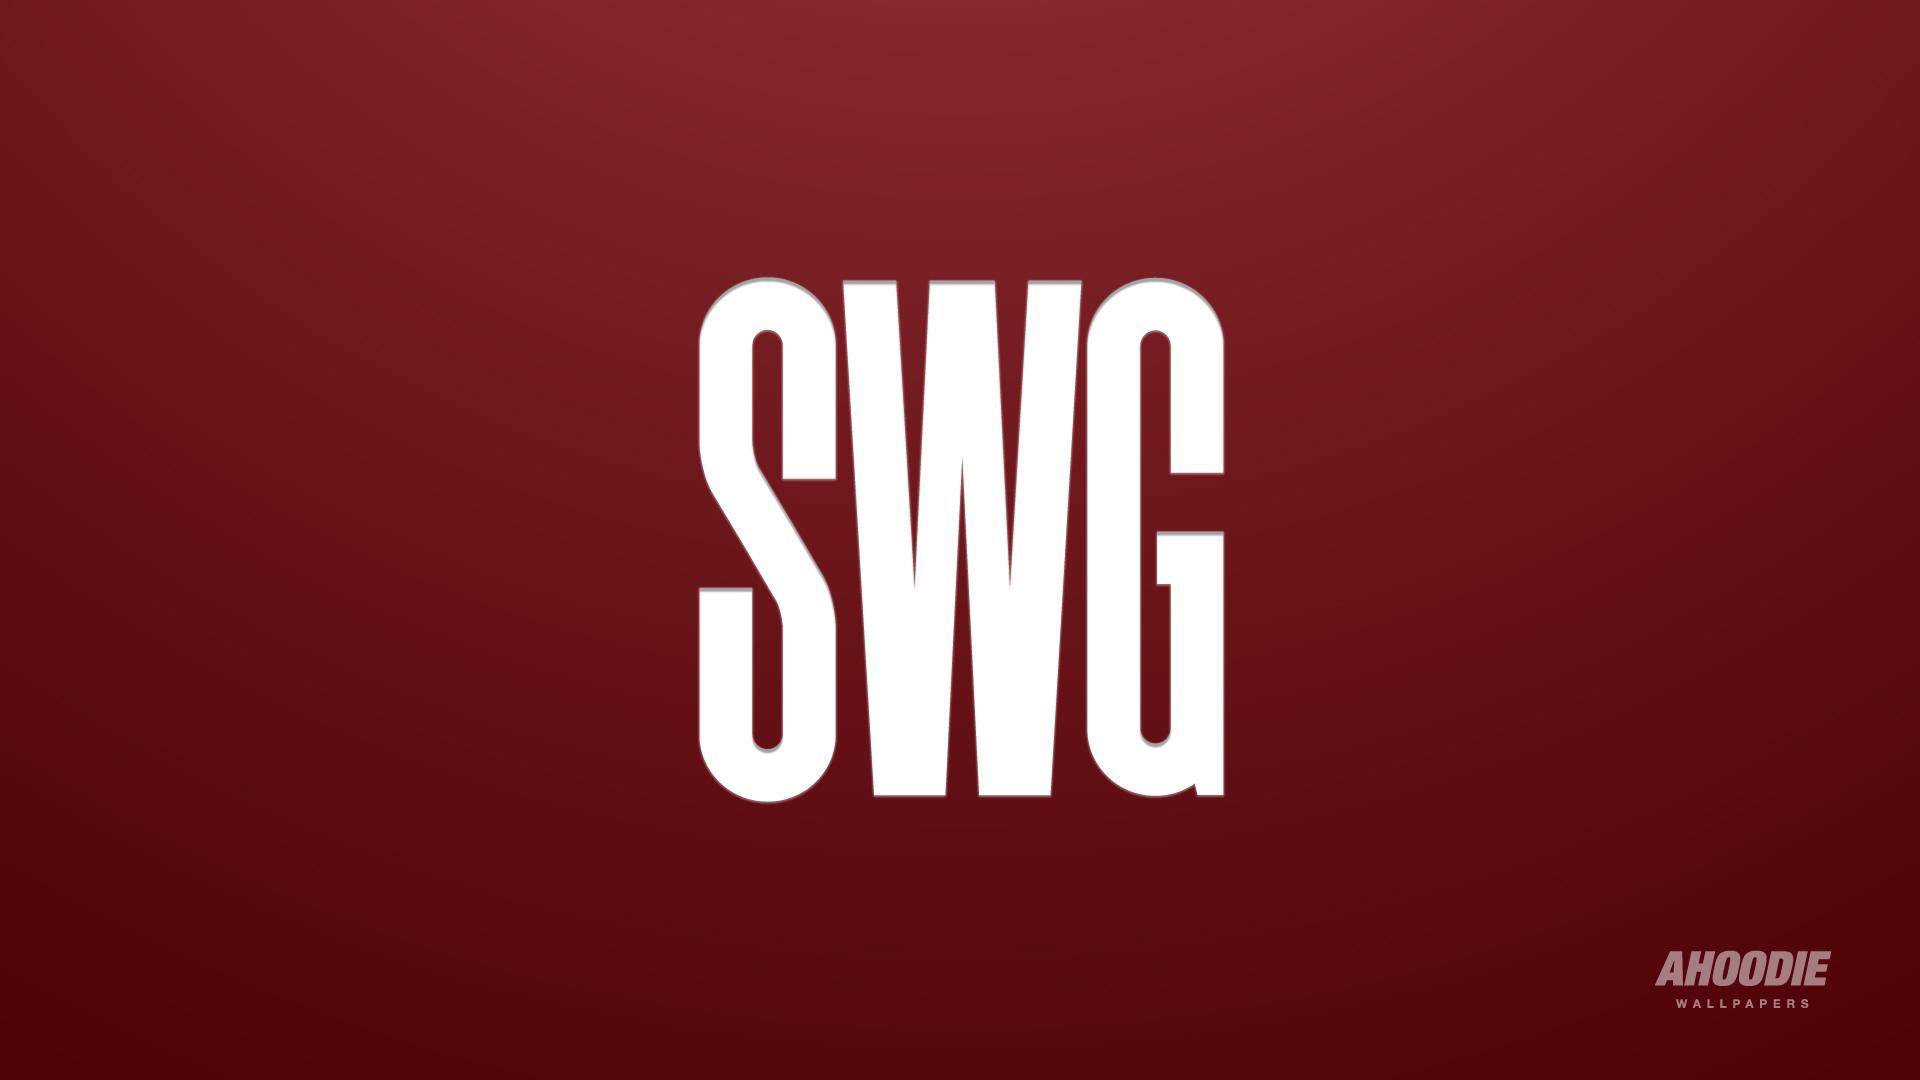 Cool Wallpaper Logo Swag - 693664  Image_545395.jpg